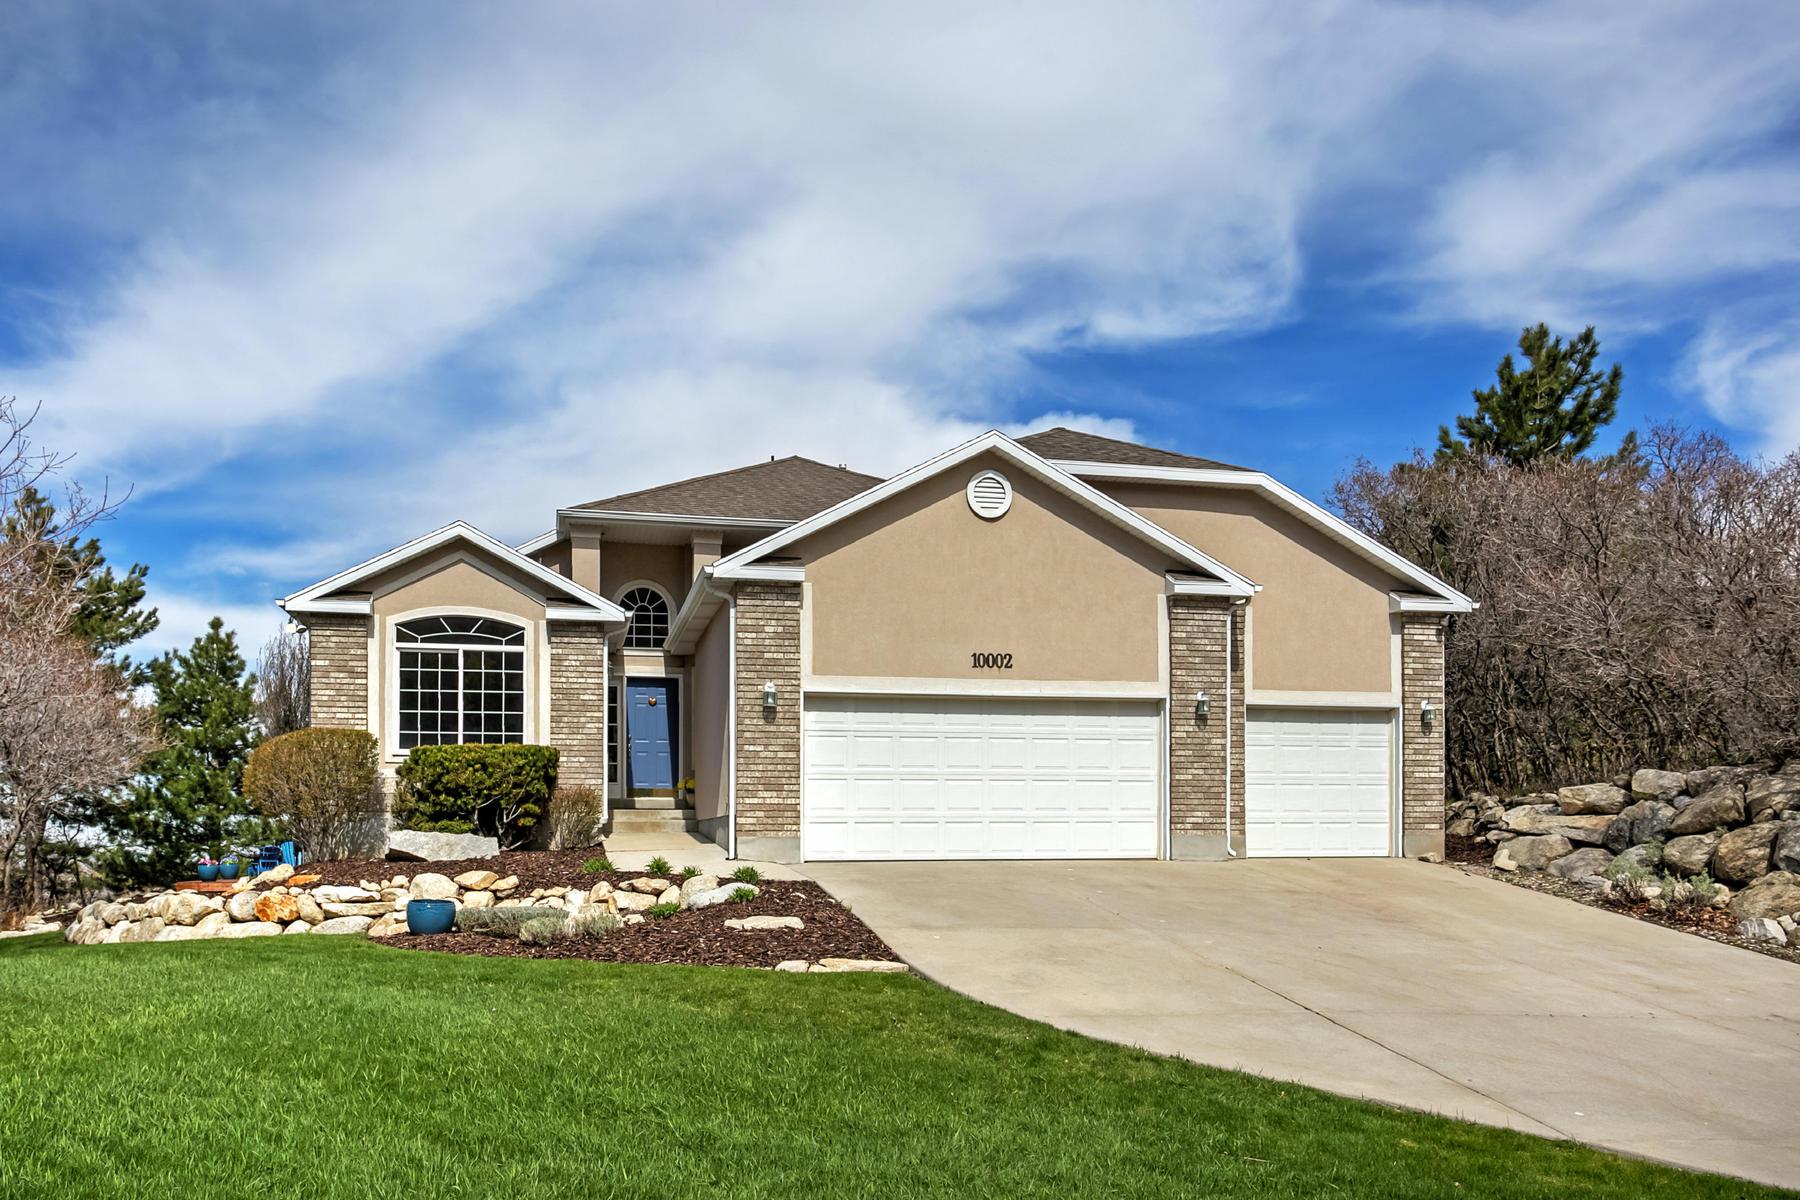 Casa para uma família para Venda às Open Concept Entertainers Dream 10002 S Stone Mountain Ln Sandy, Utah, 84092 Estados Unidos